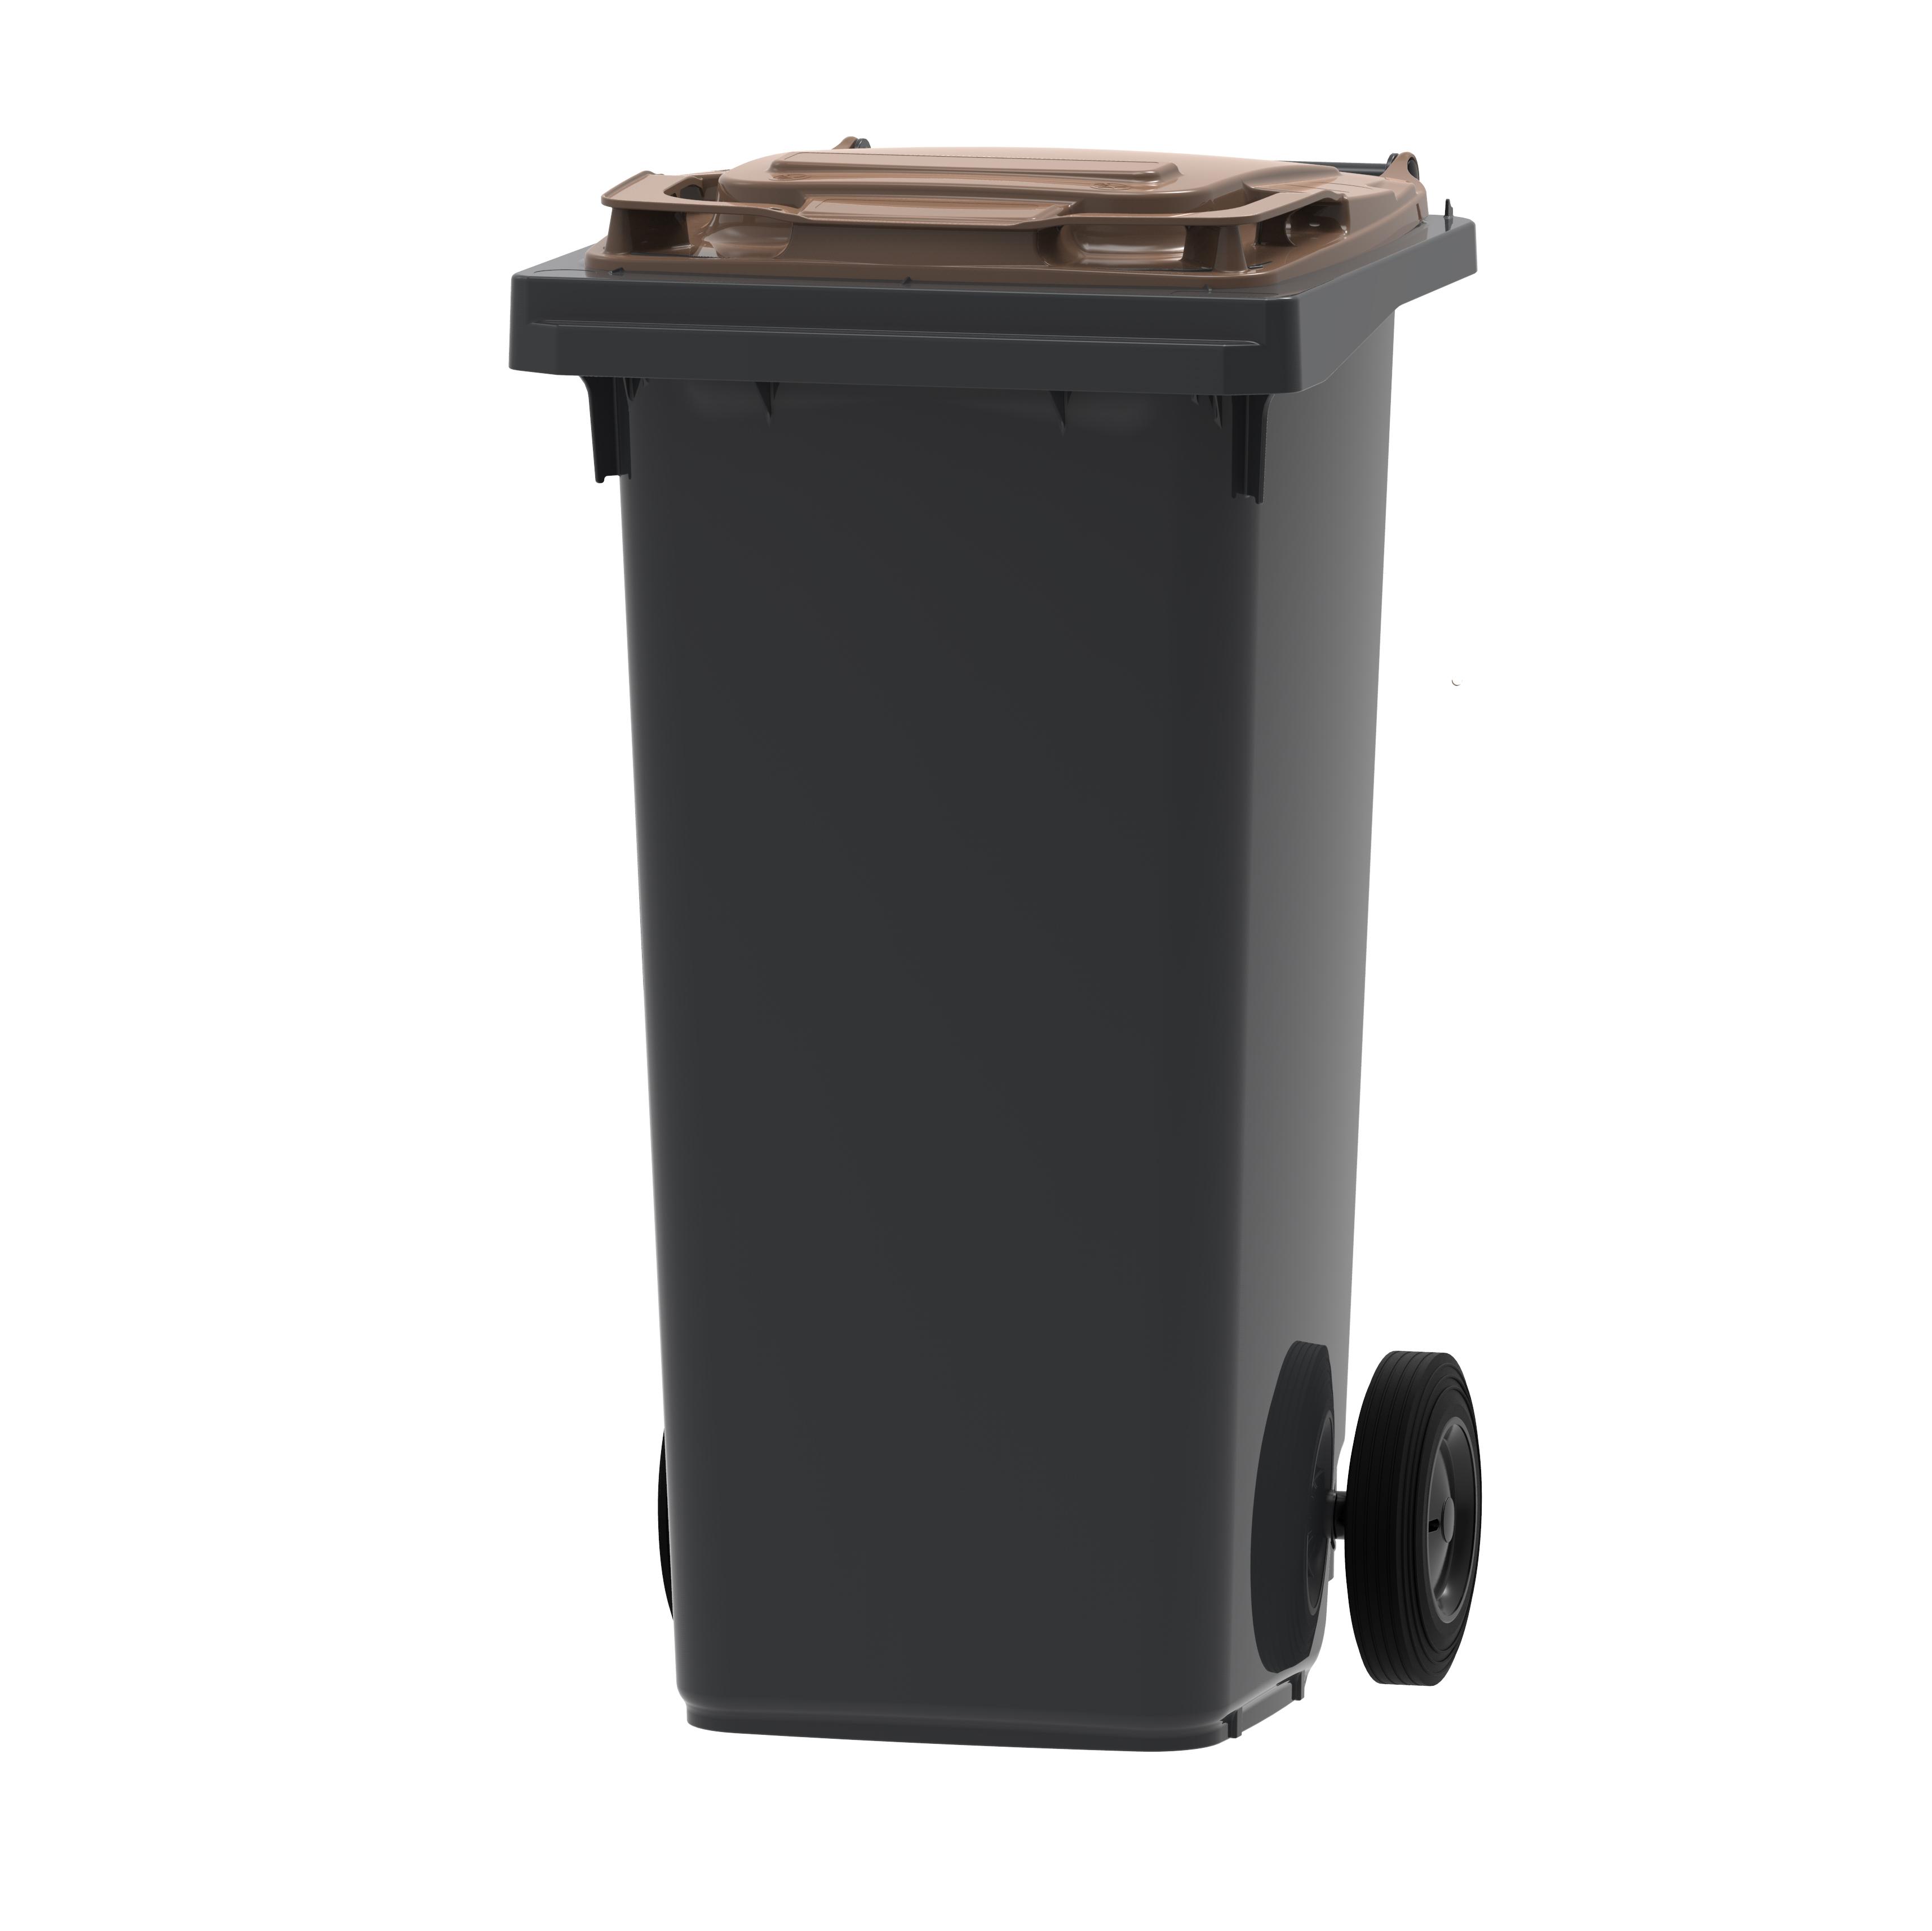 Vepa Bins Mini-container DonkerGrijs/Bruin 120 ltr (VB120000BR)